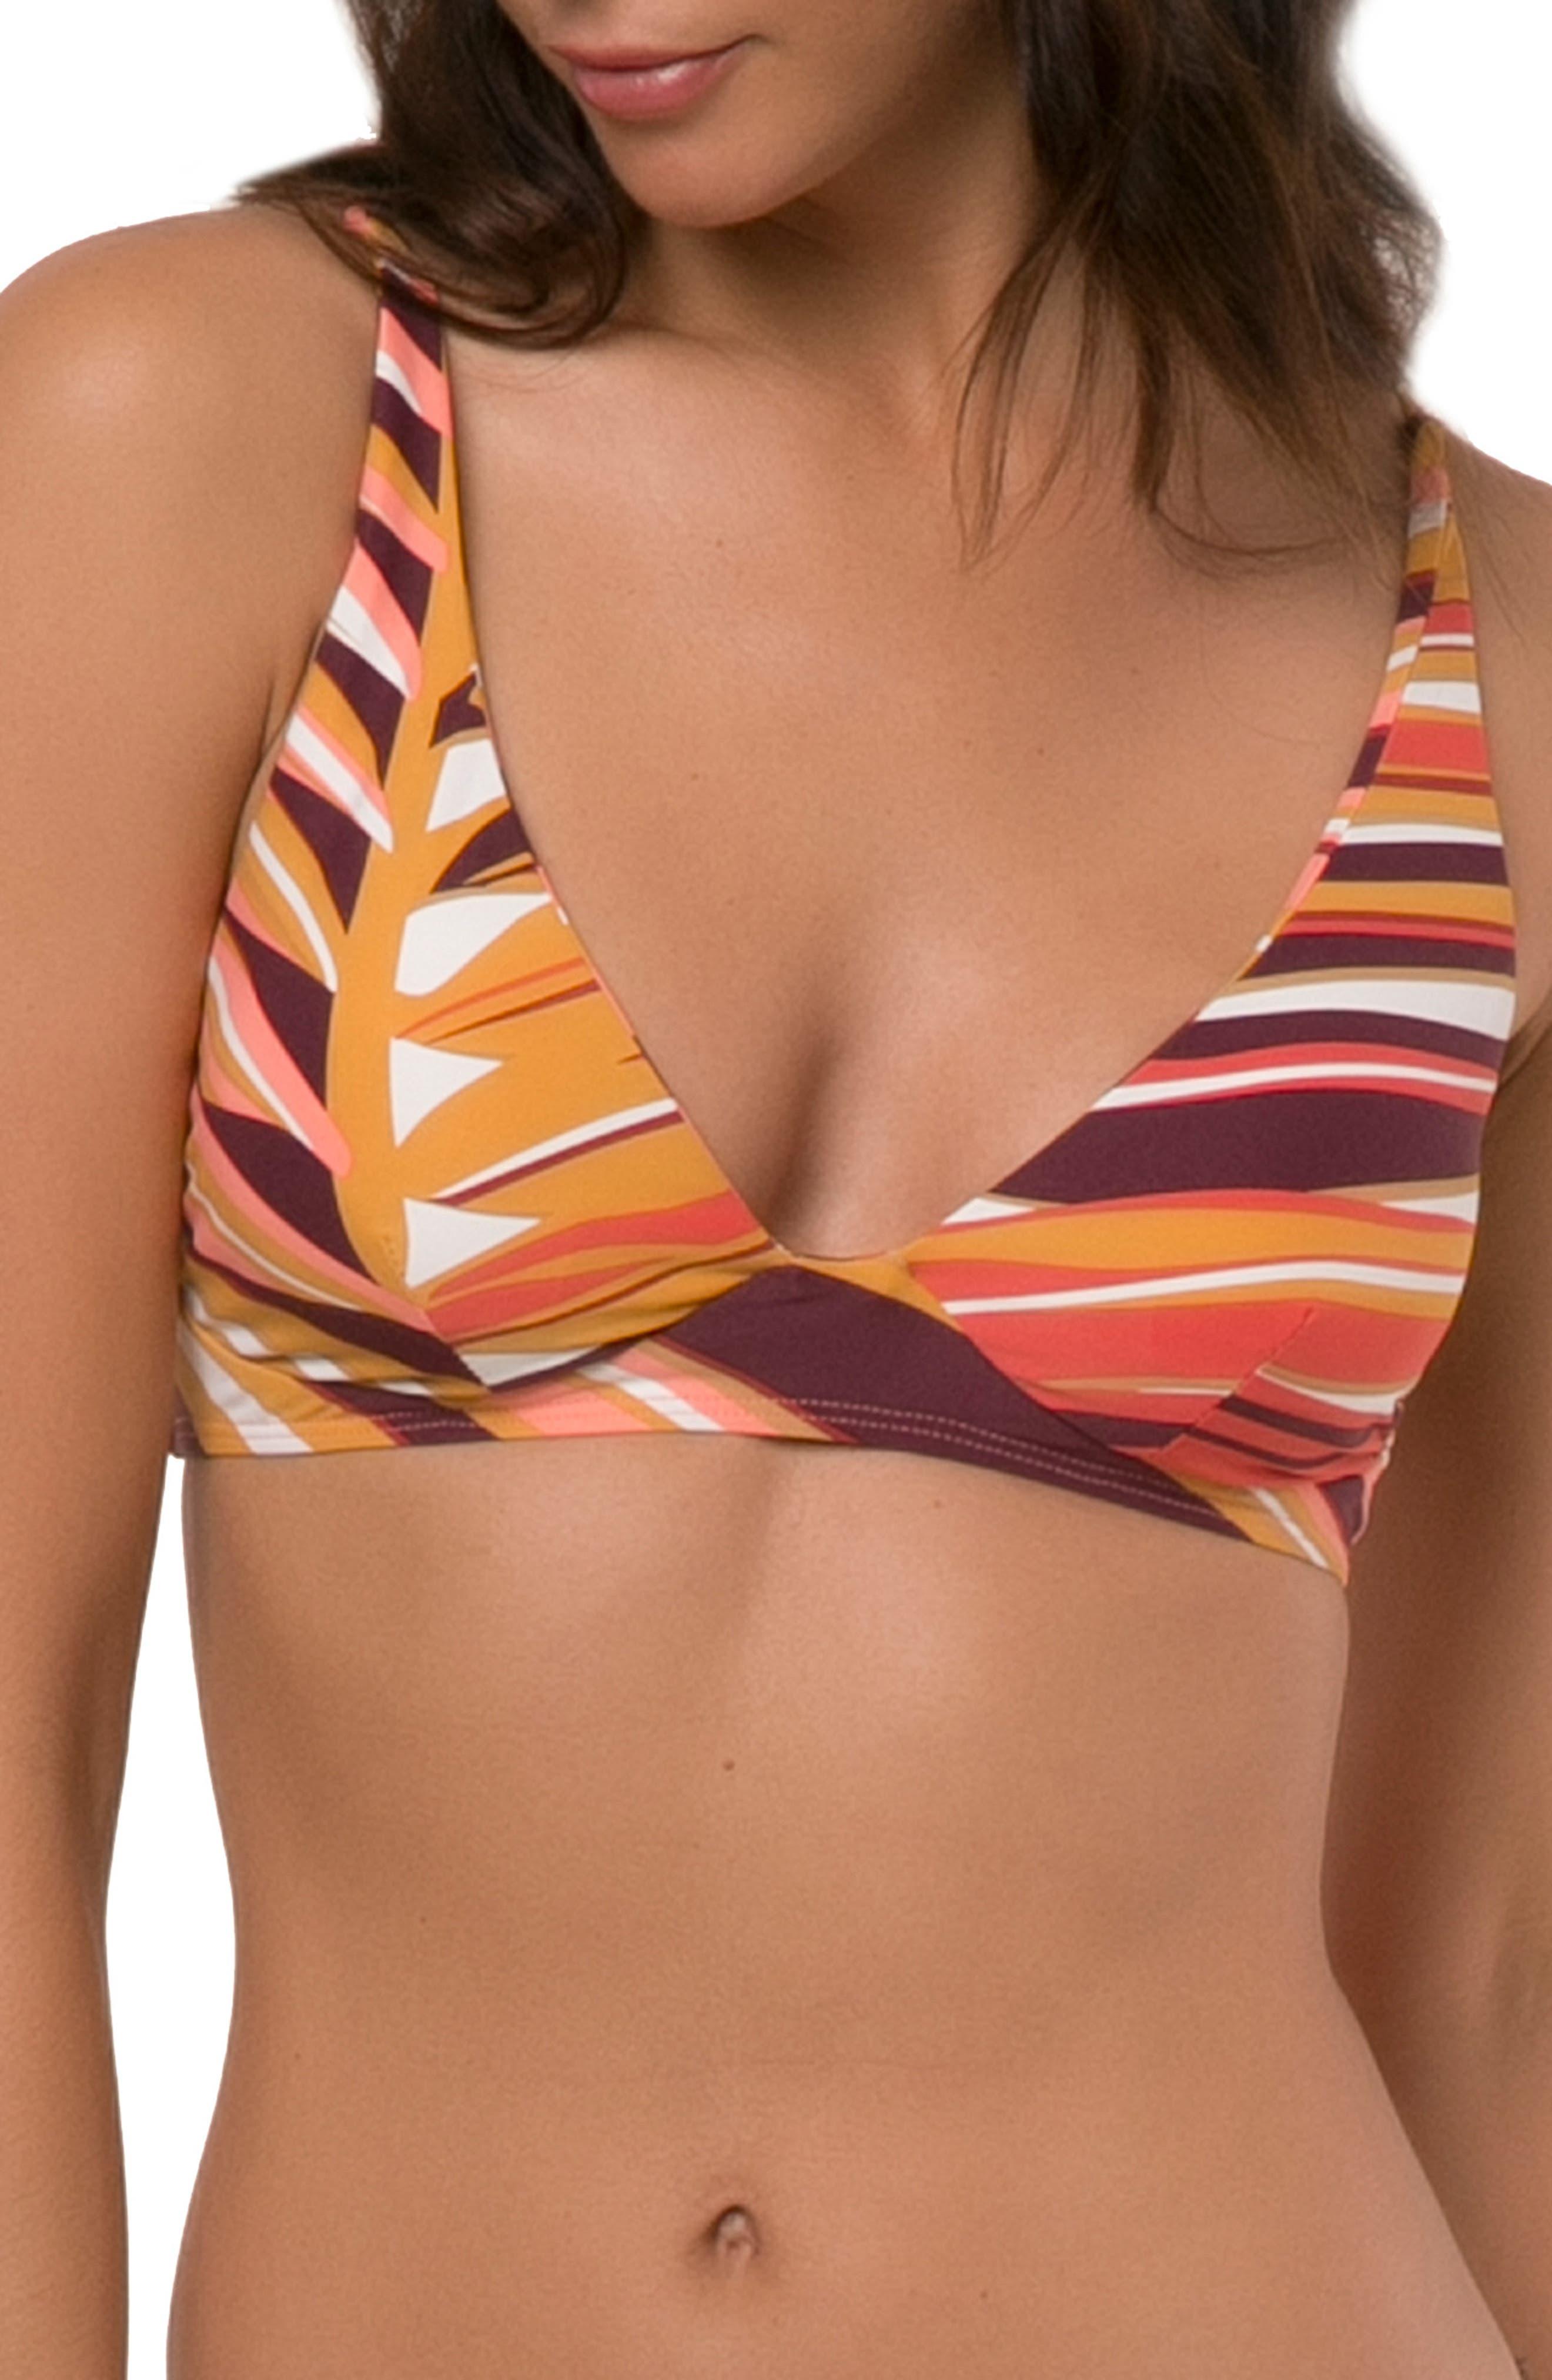 Anacapa Bikini Top,                         Main,                         color, PURPLE MAUVE